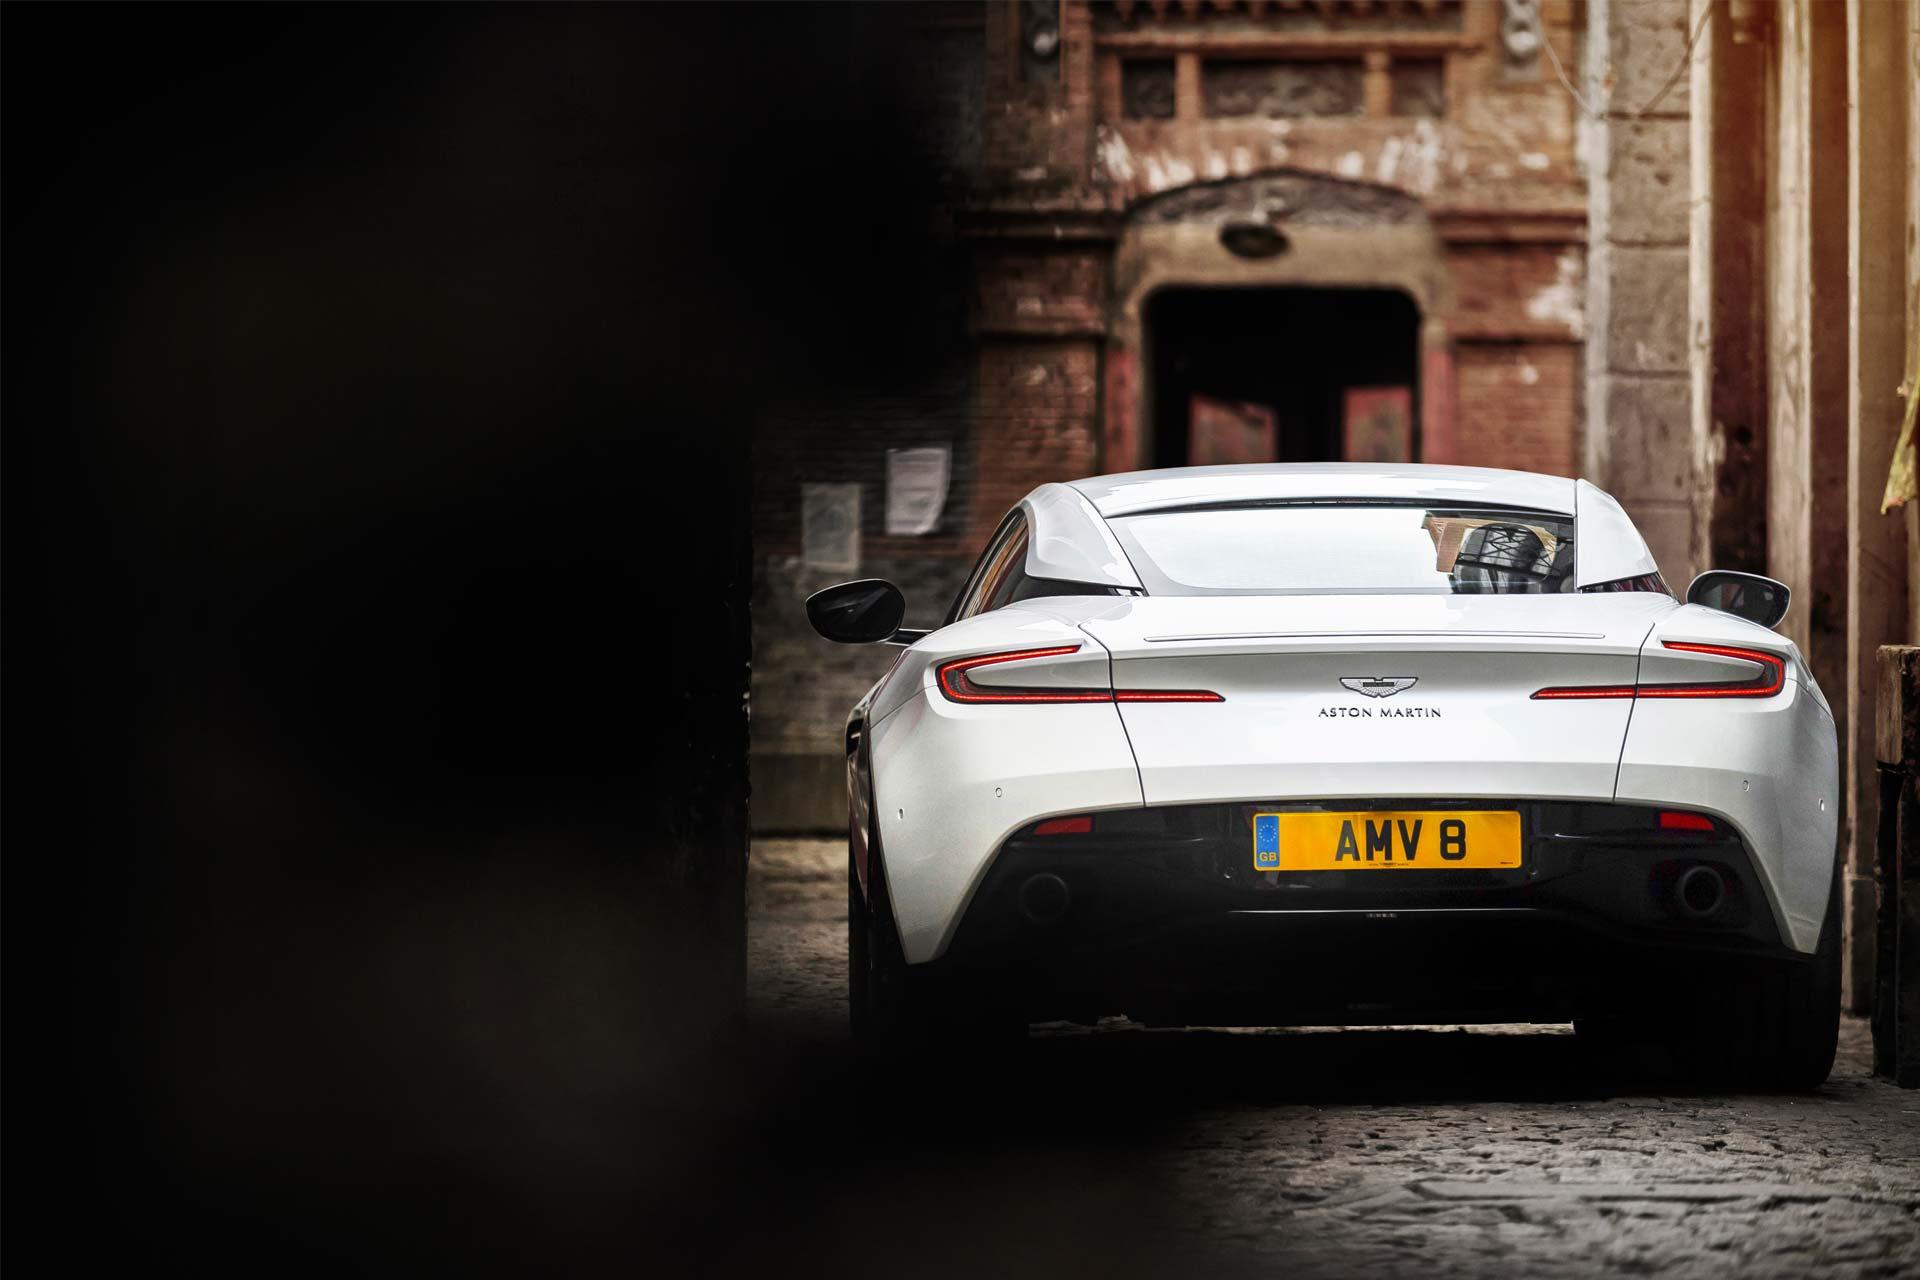 Aston-Martin-DB11-4.0-V8-3